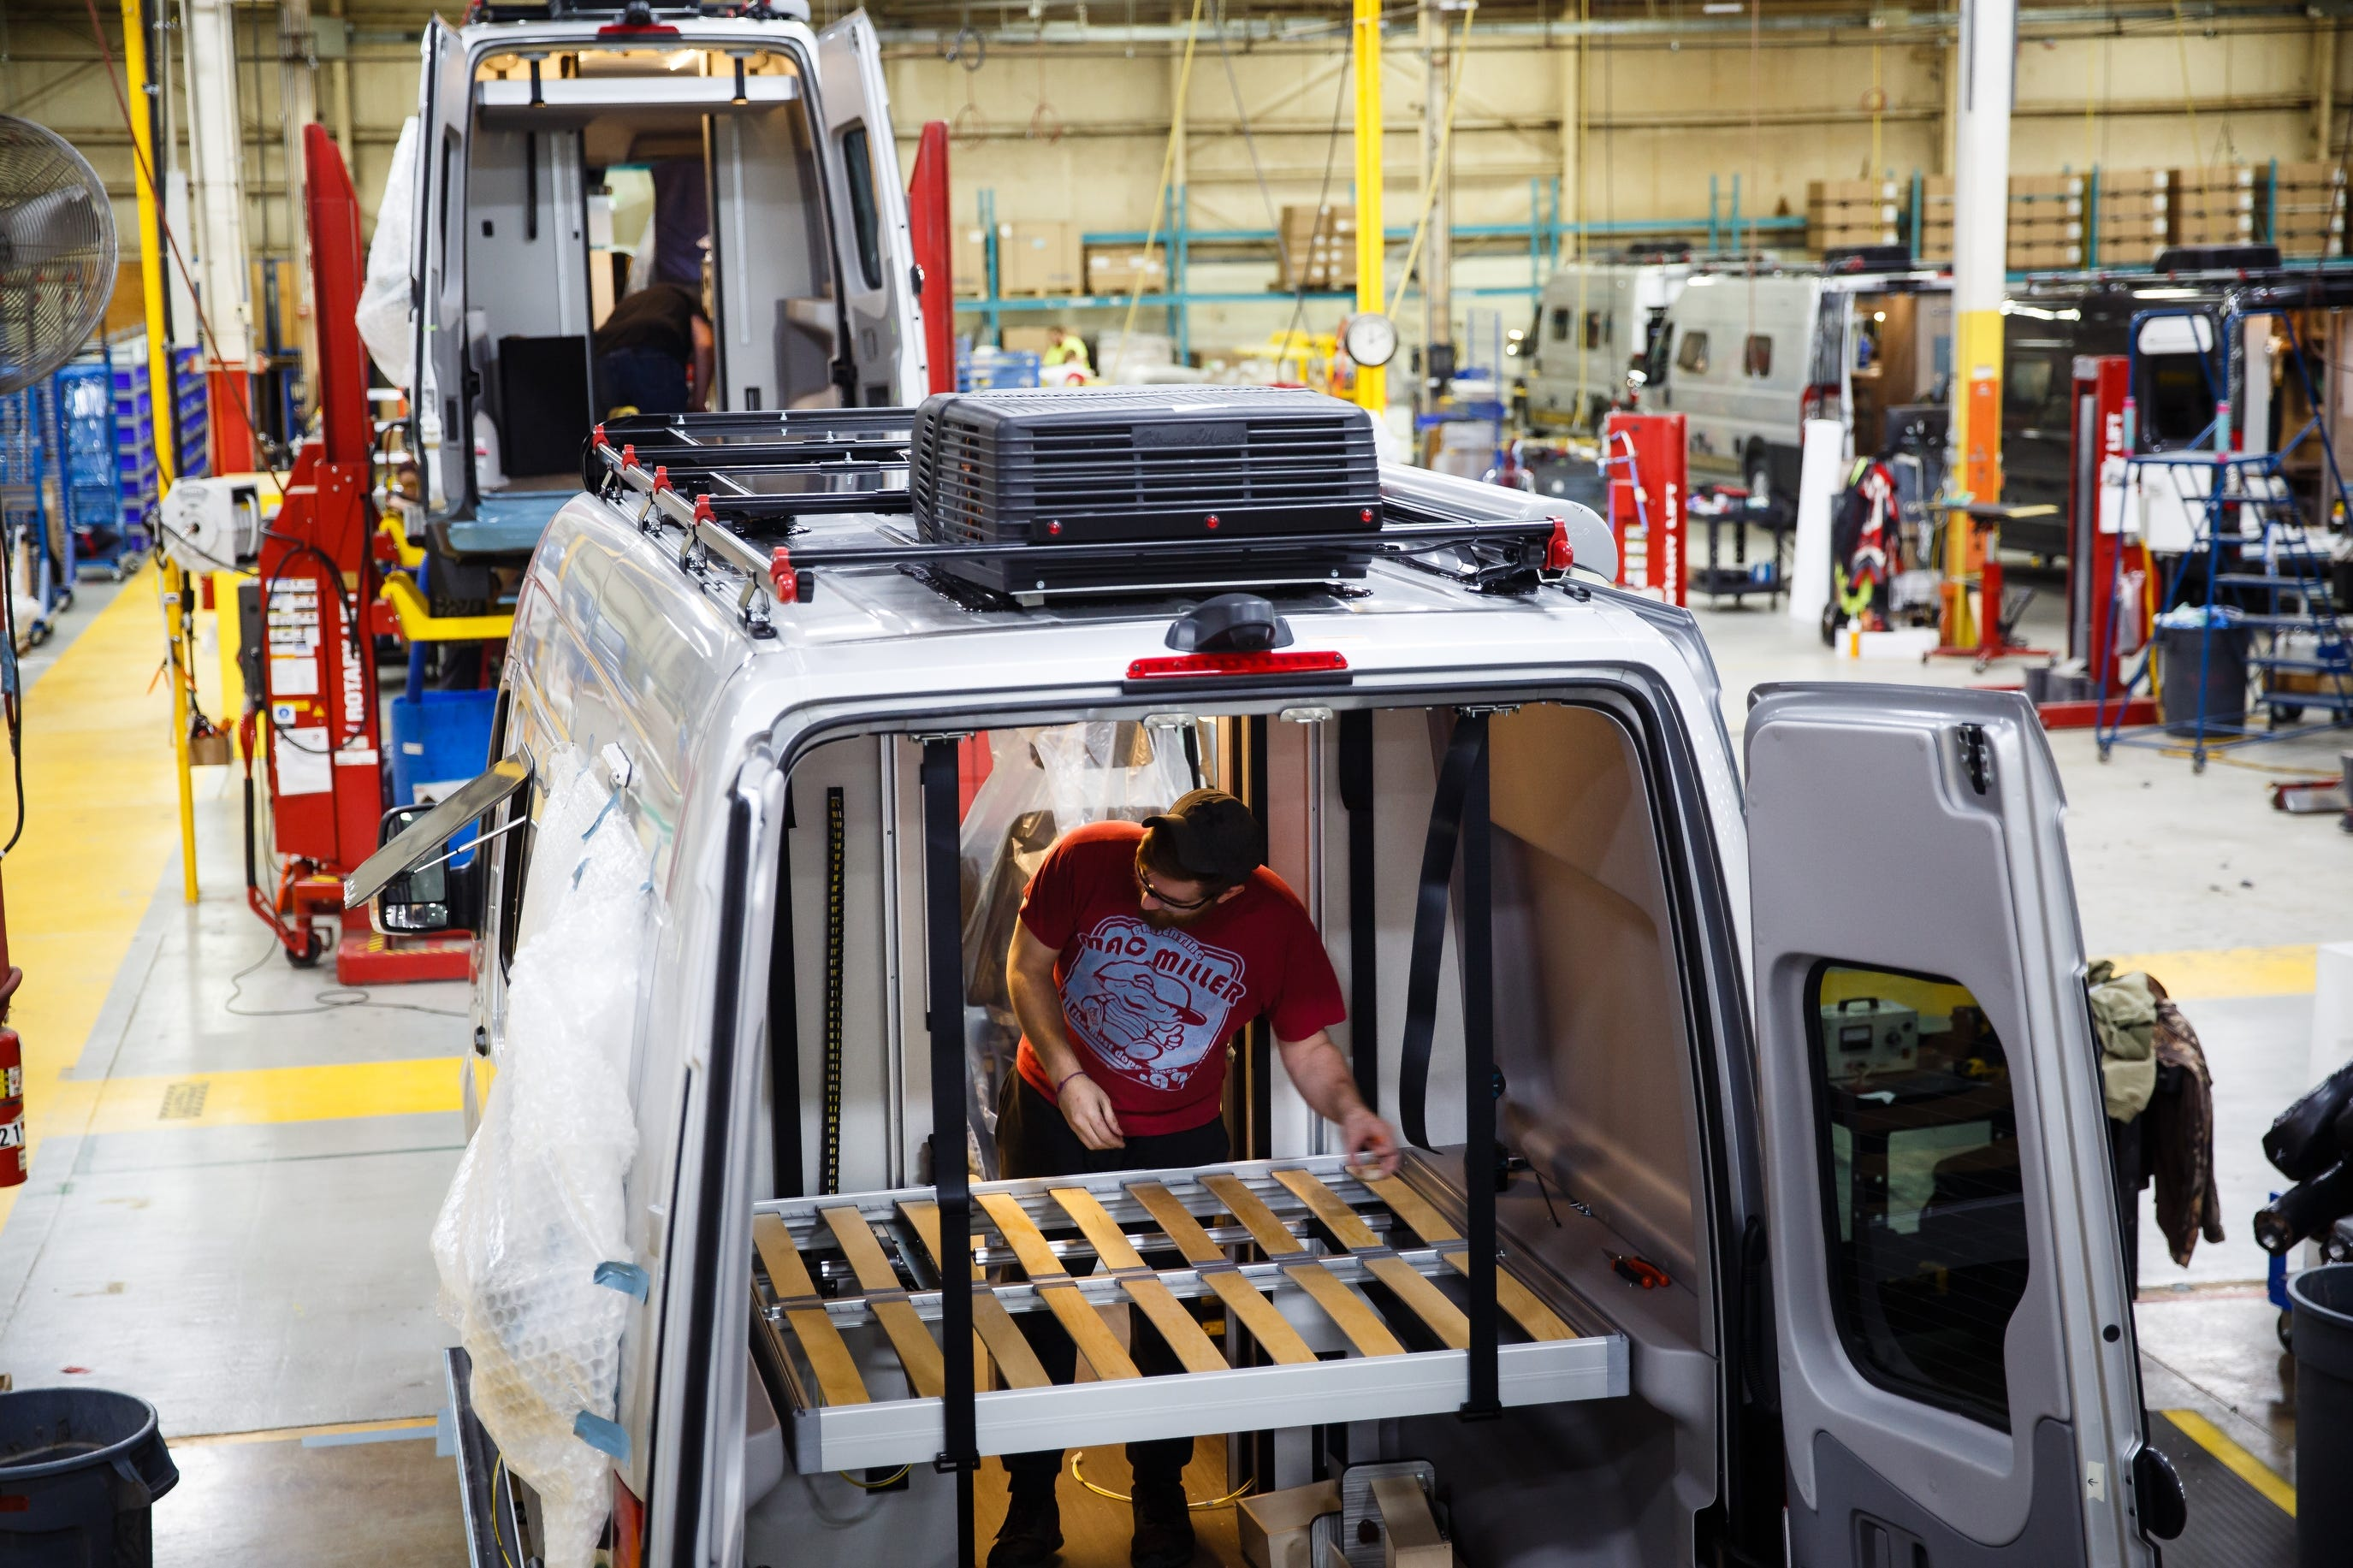 Meet the new Winnebago Industries: How icon is embracing sleek vans to attract younger buyers